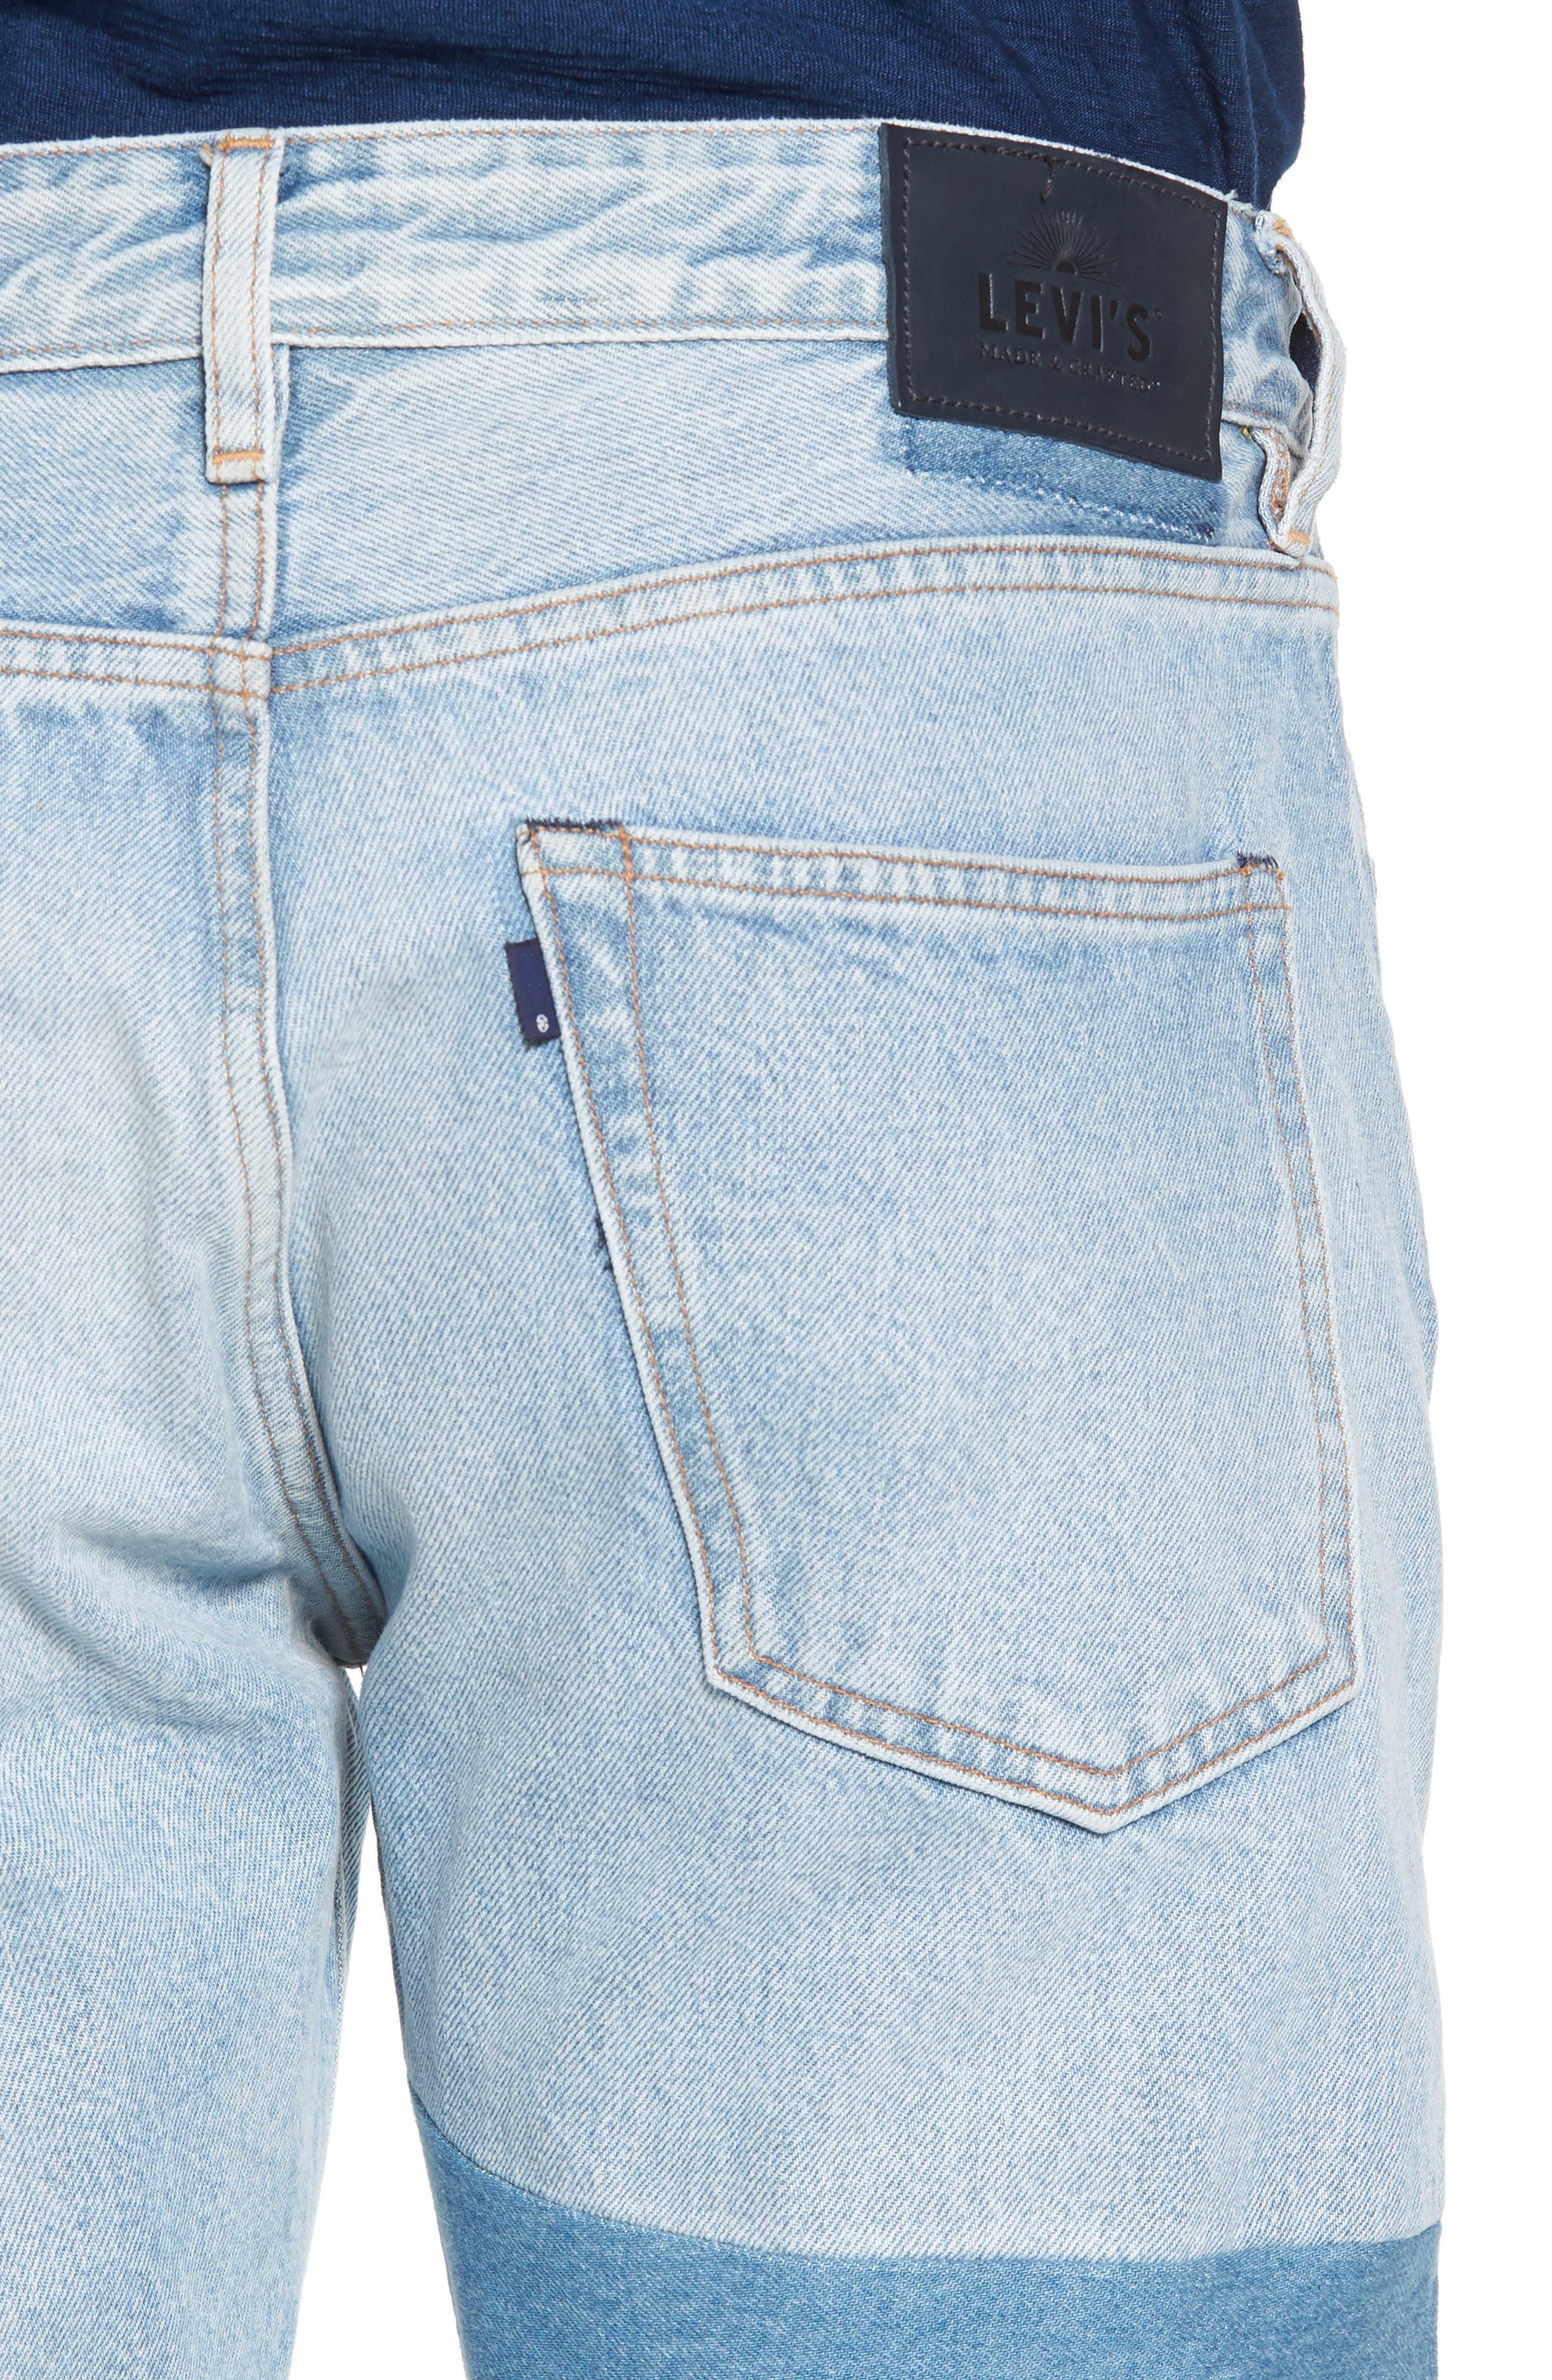 Studio Slim Fit Jeans,                             Alternate thumbnail 4, color,                             420